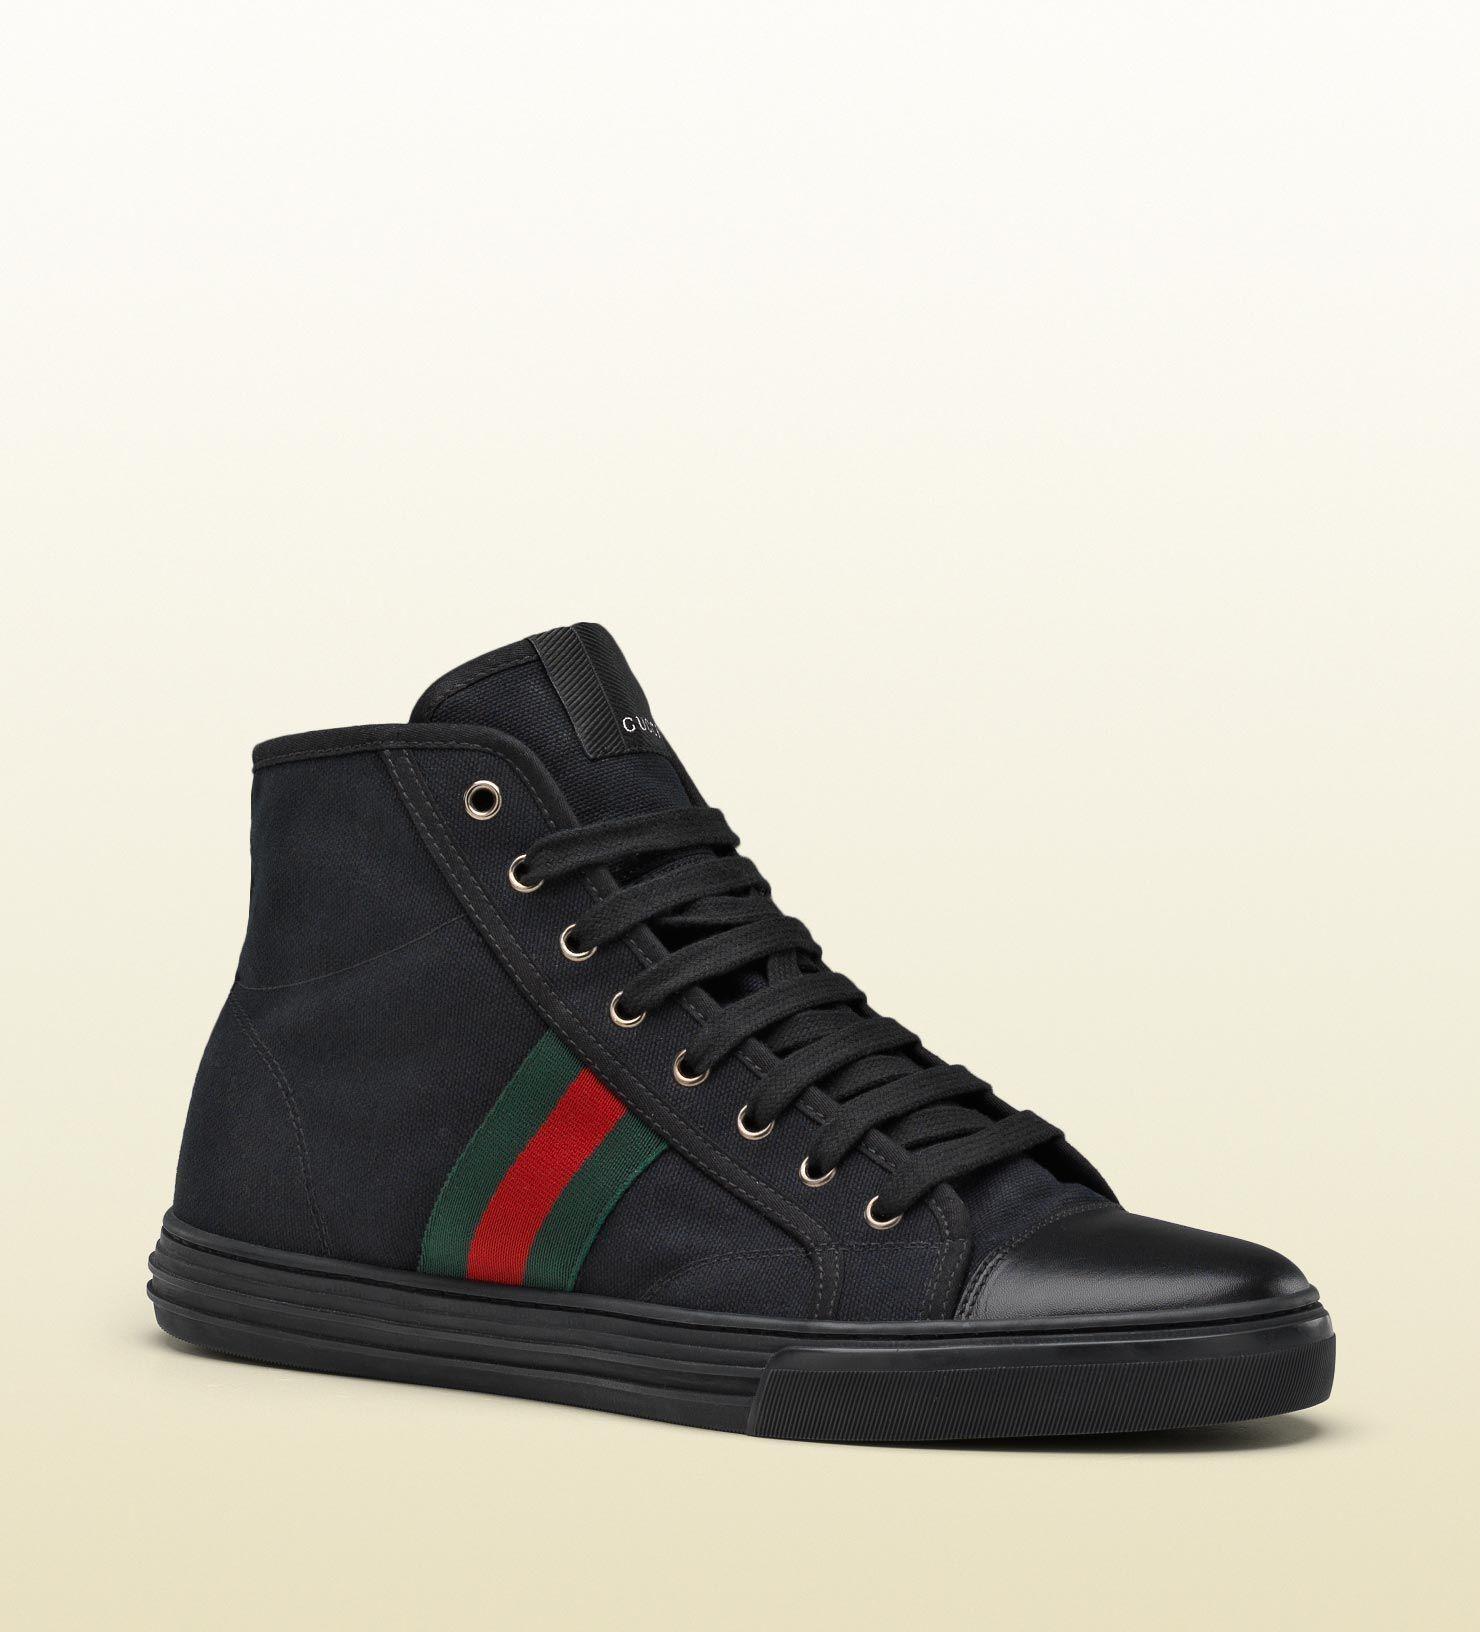 8d3847564ac9 Gucci sneaker Gucci Sneakers